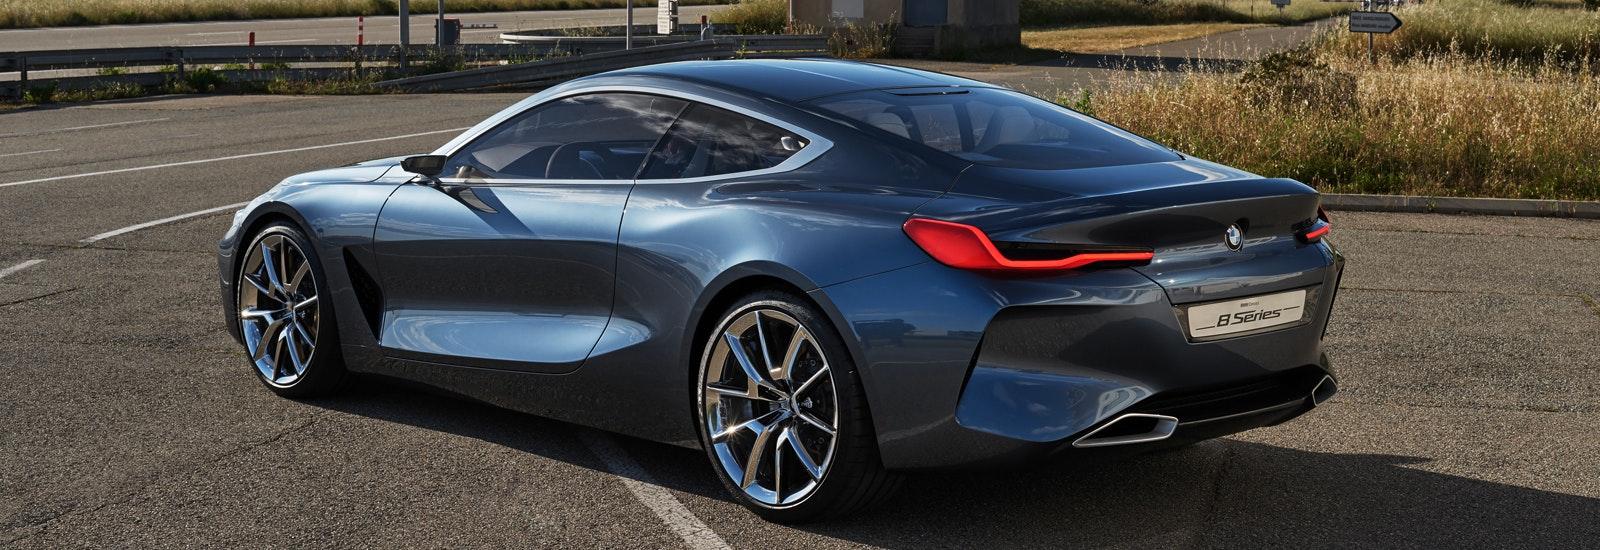 BMW-8-series-prices-official.jpg?ixlib=rb-1.1.0&fit=crop&w=1600&h=&q ...